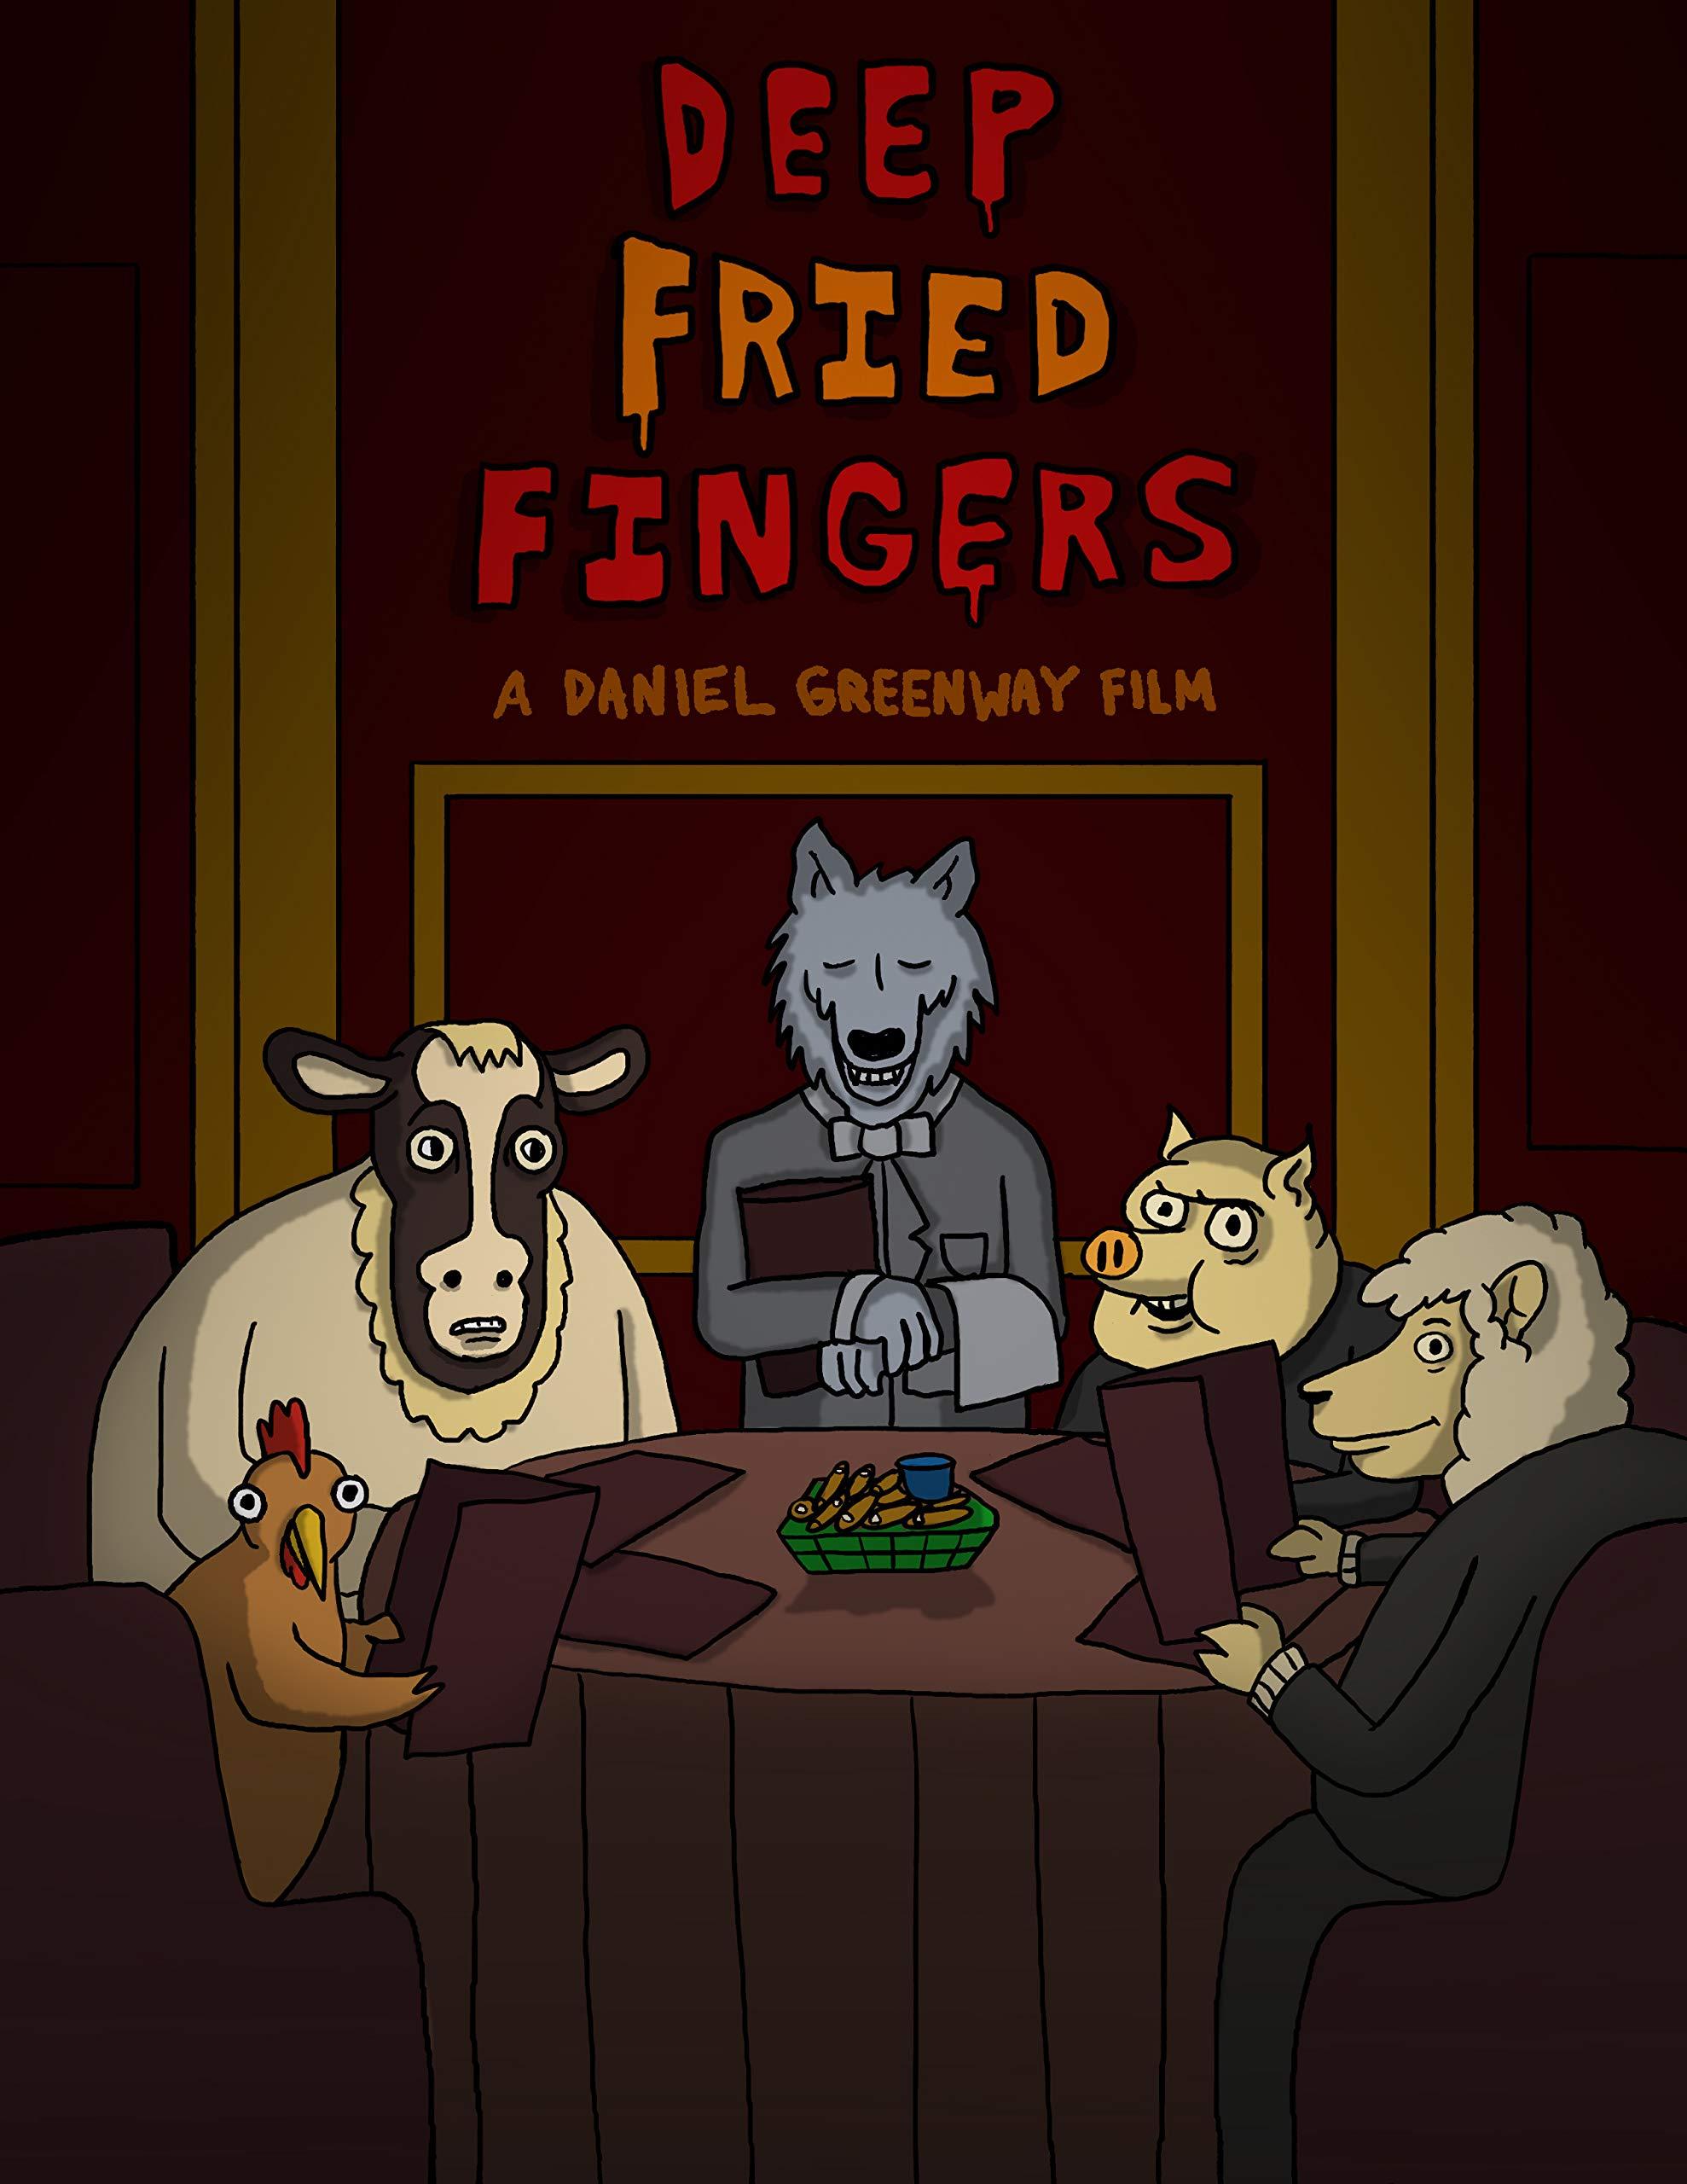 Deep-Fried Fingers